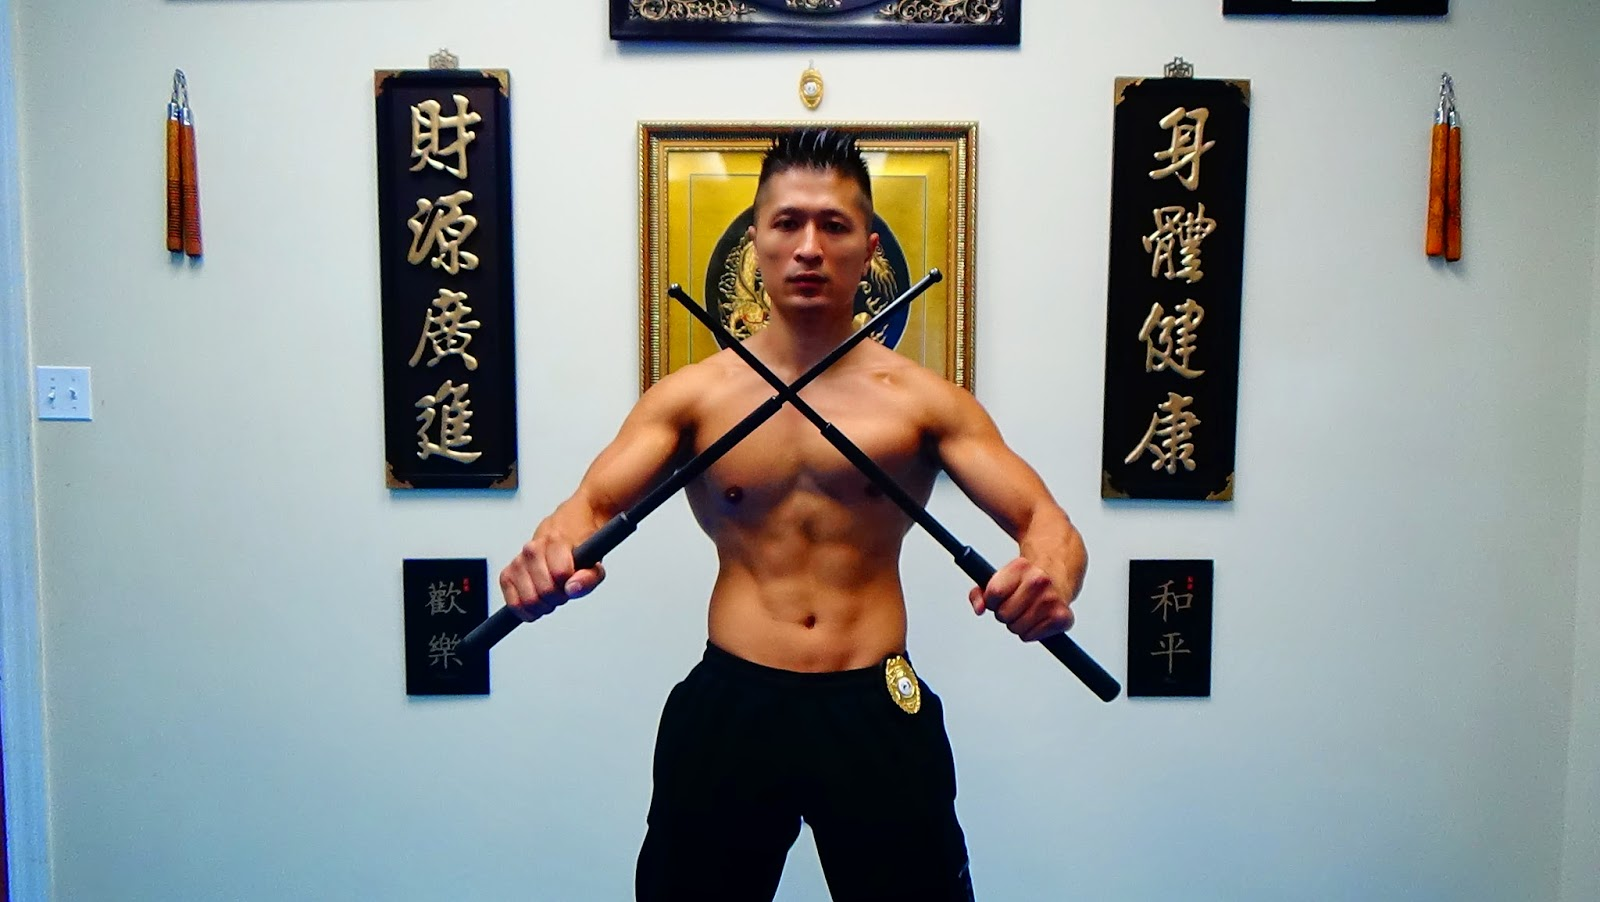 Kung fu porn tao of sex